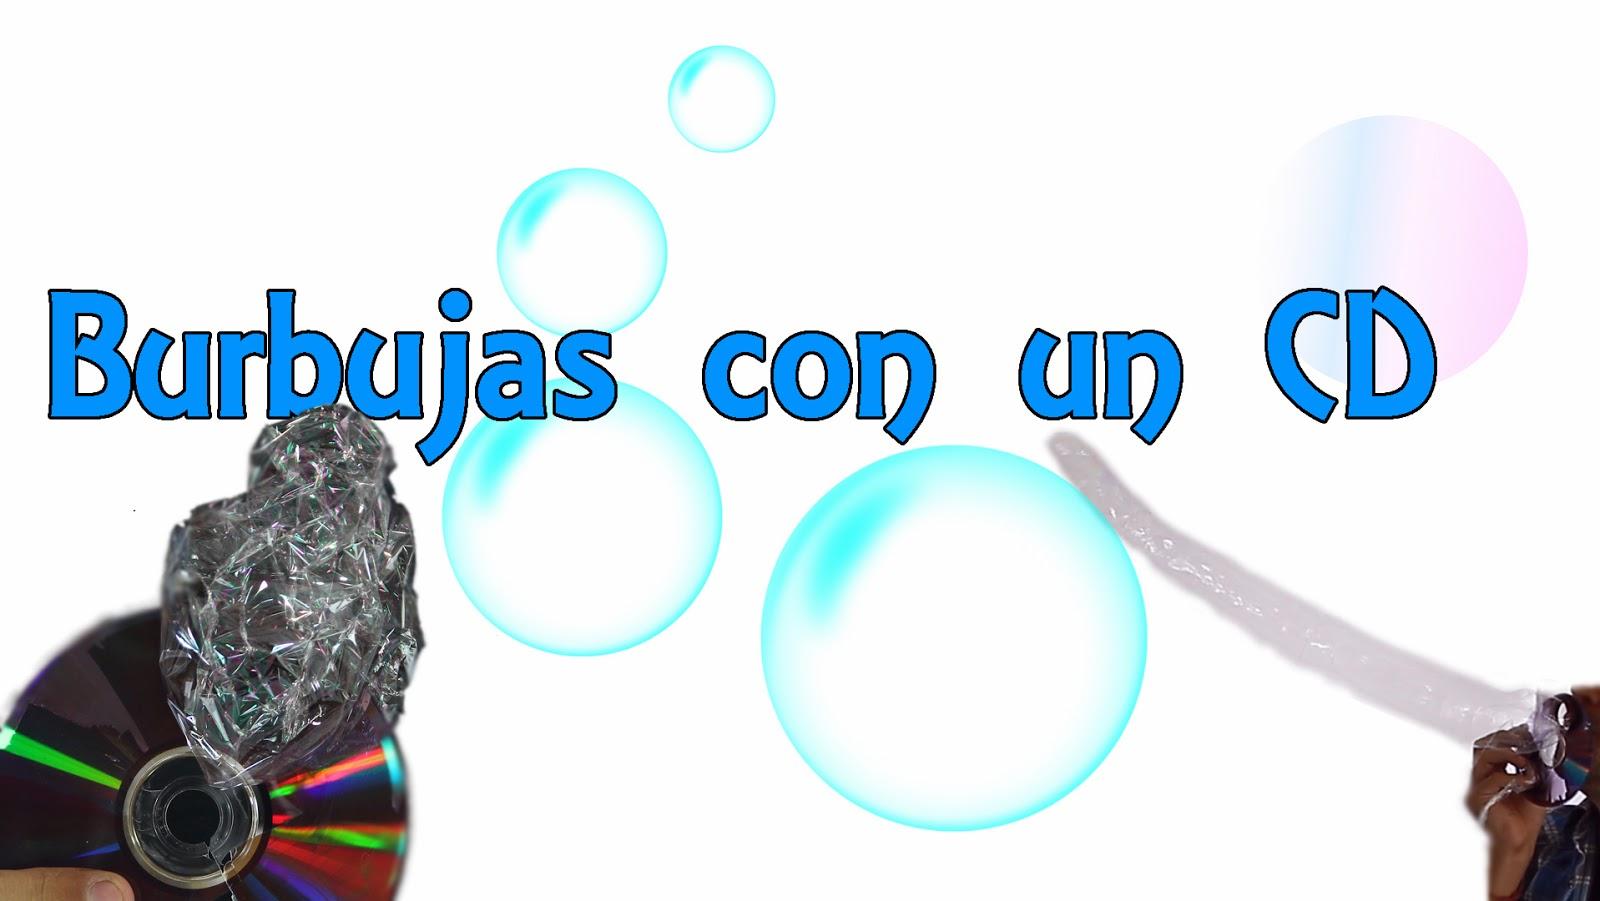 Burbujas con un CD, Experimentos caseros, experimentos, experimento, experimentos de física, invento casero, inventos, experimentos para niños, experimentos sencillos, trucos con un cd, condón de cd